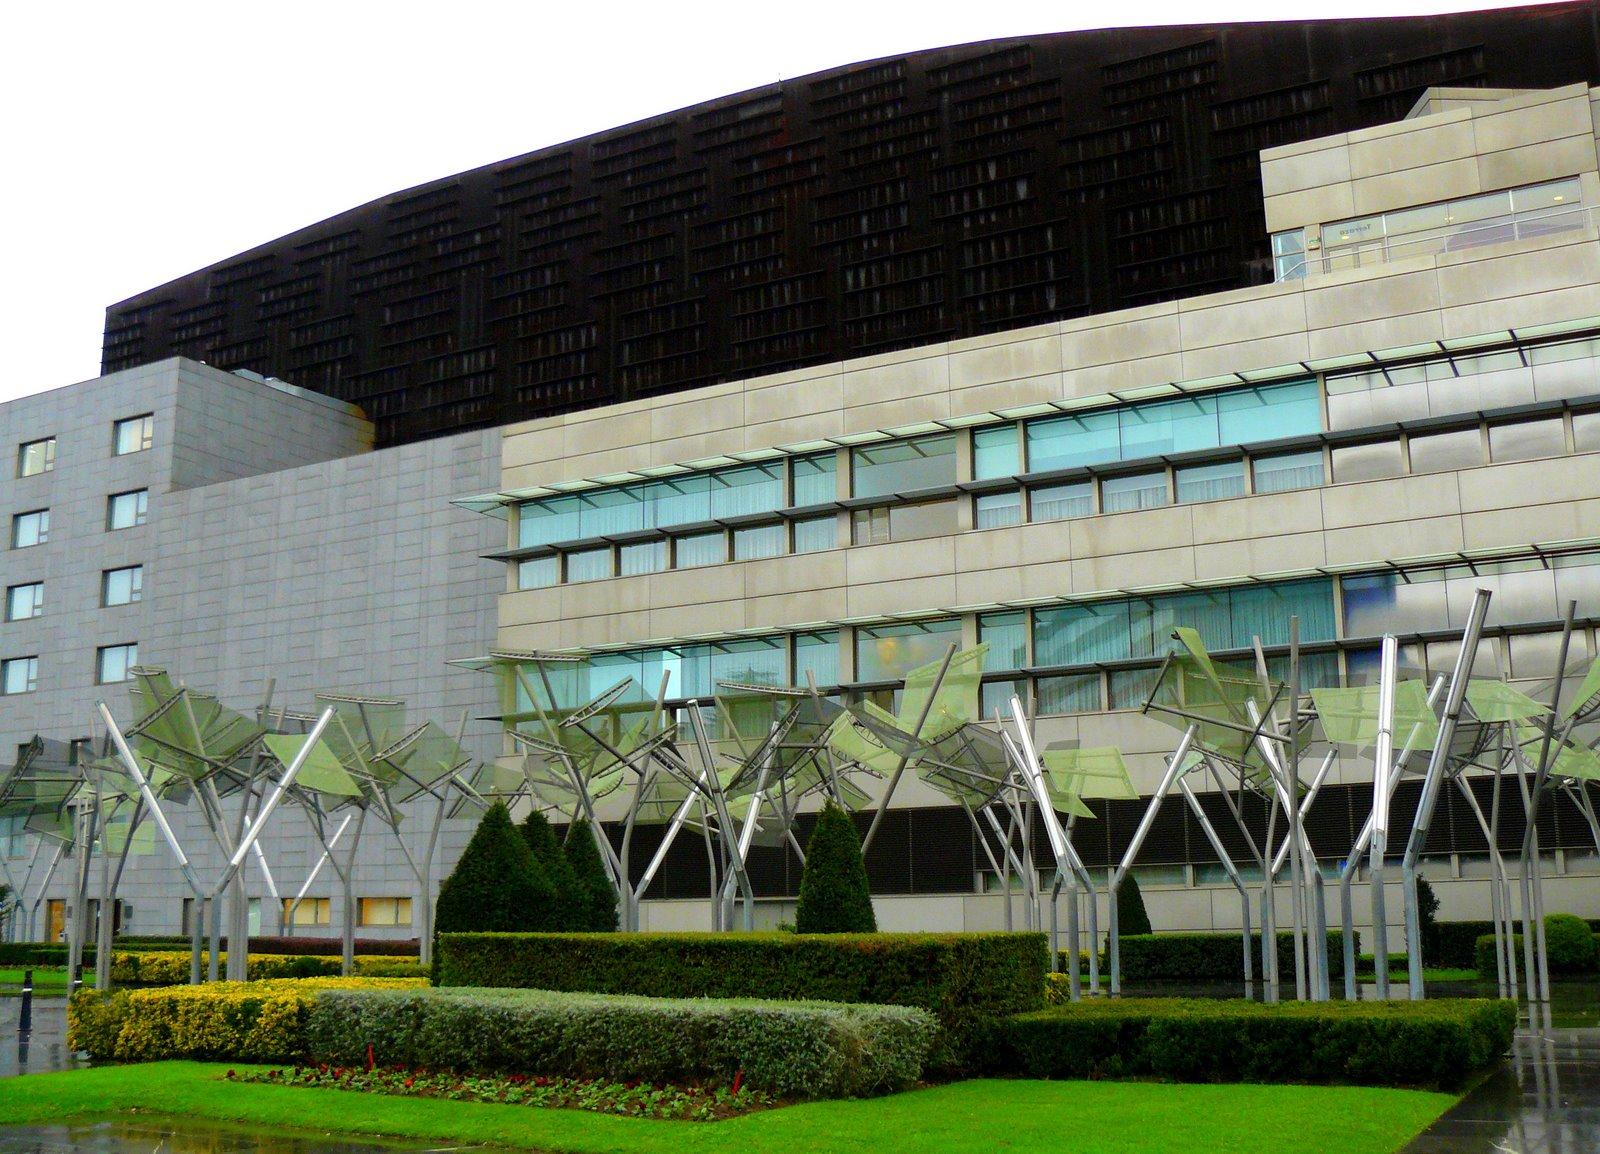 IMAR - Arquitectura & Metal // Architecture & Metal: Euskalduna Confe...